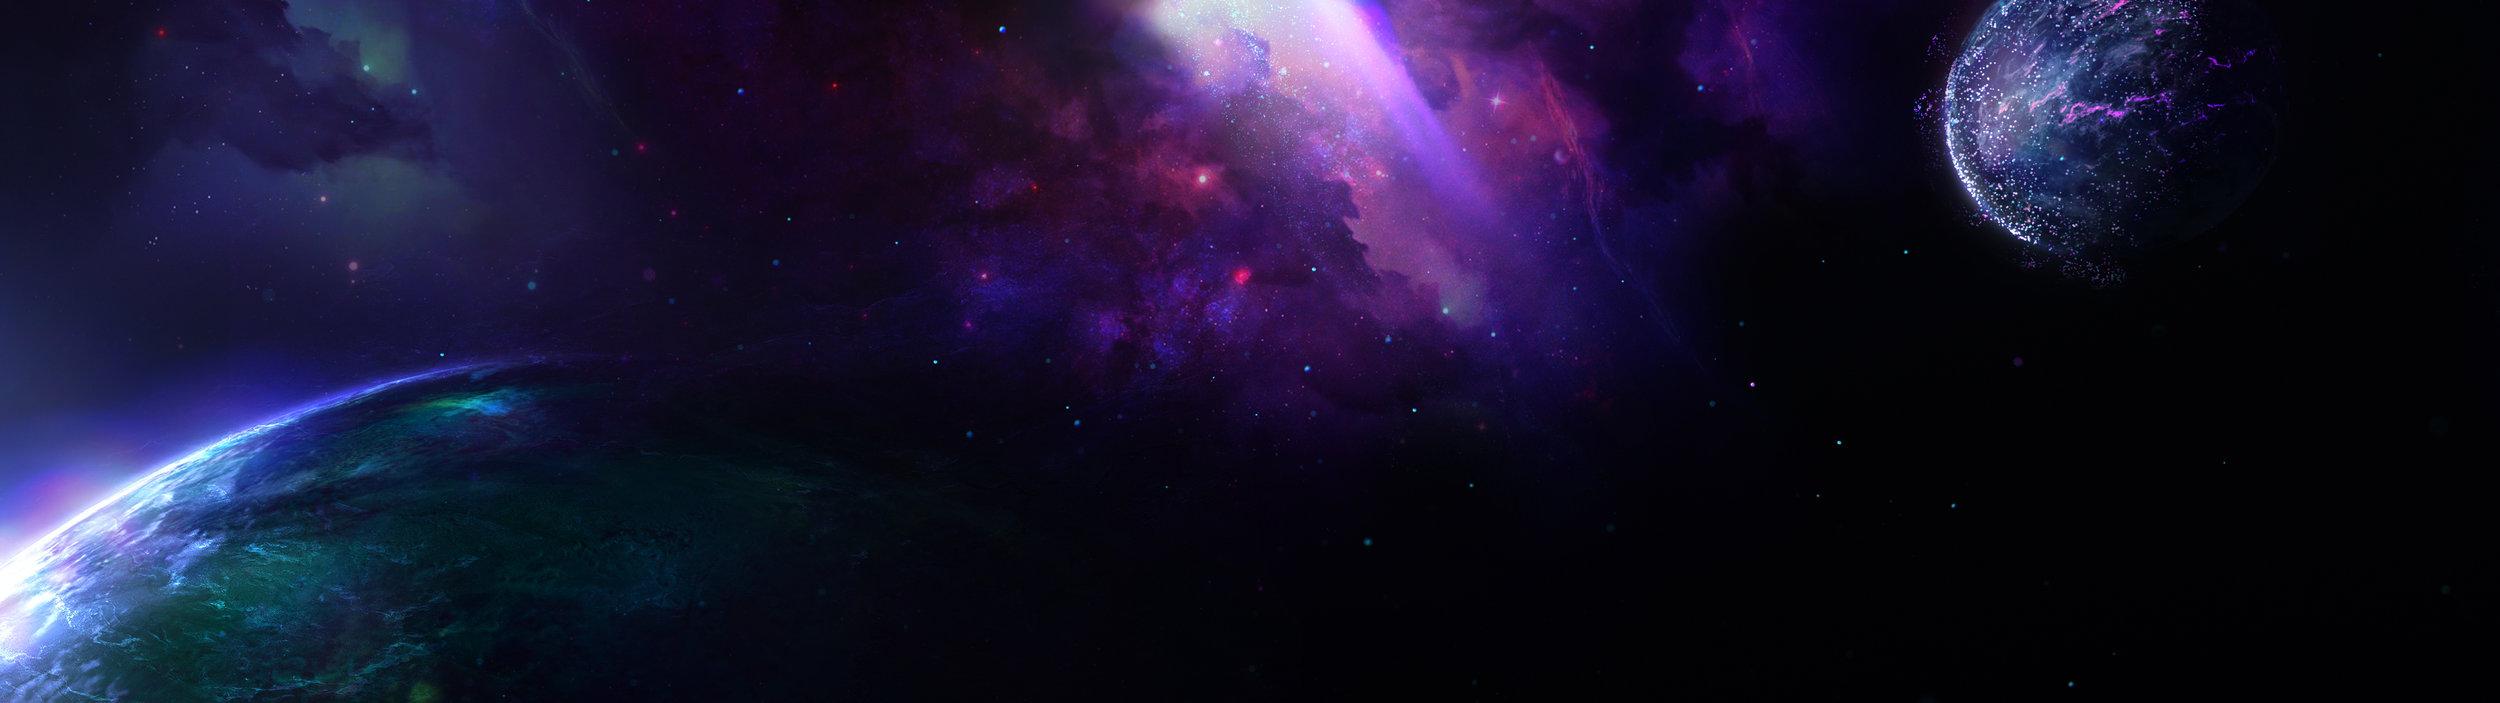 Kygo_Space_Design01.jpg